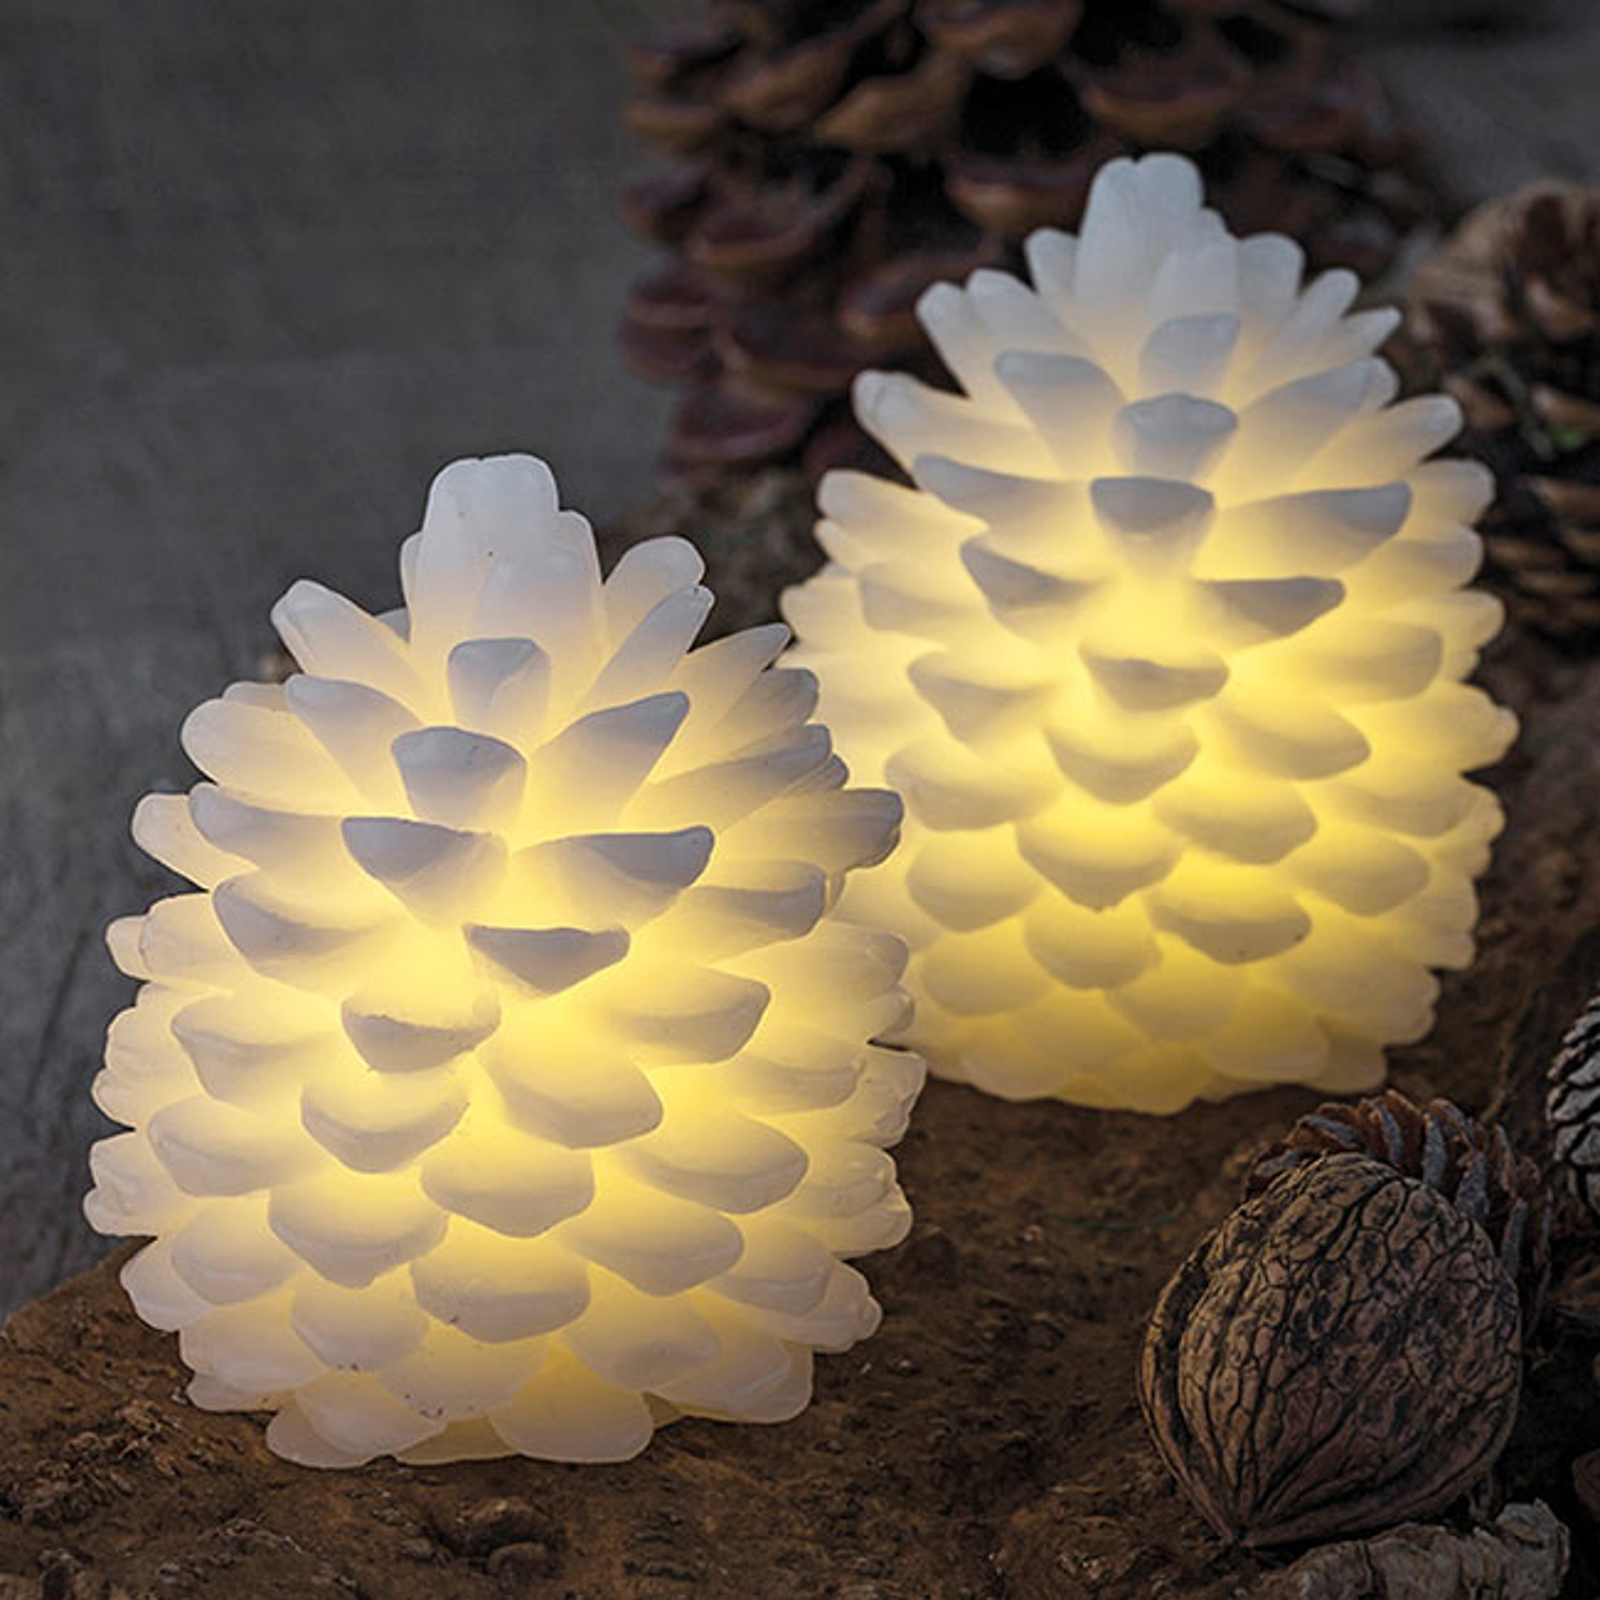 LED-Kerze Clara, Höhe 10 cm, Zweierset